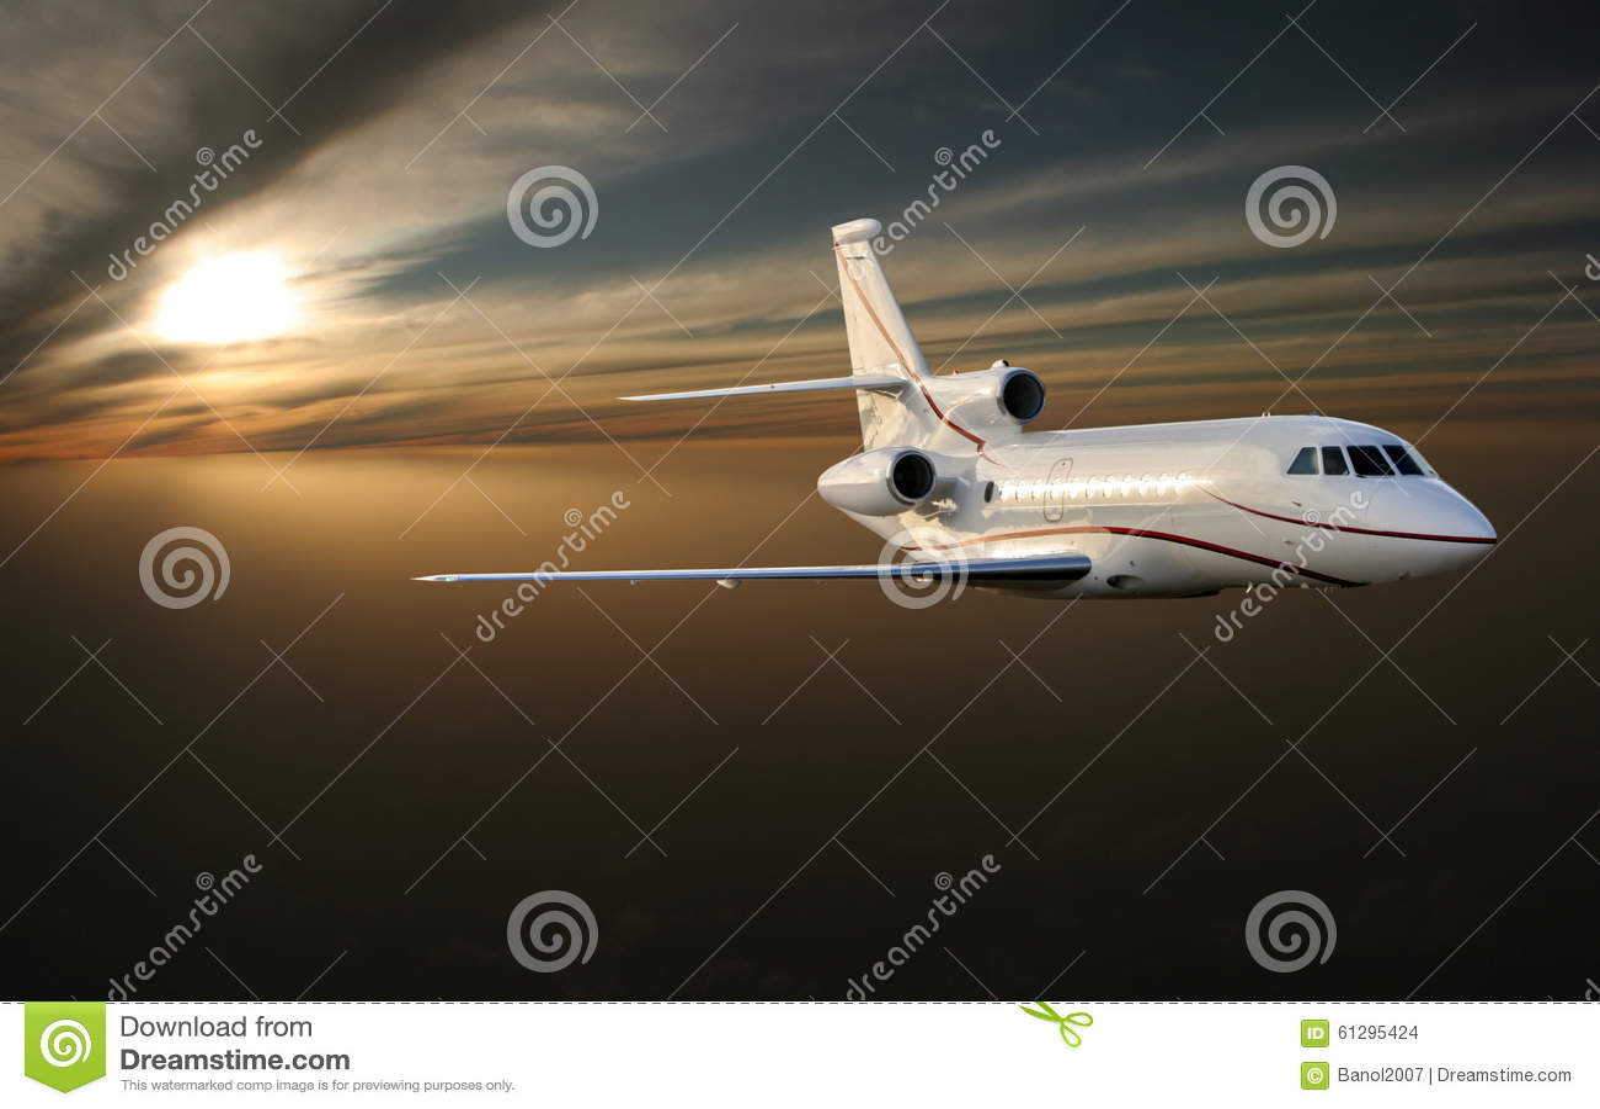 Ðœorning flight. Luxury jet plane above Earth.